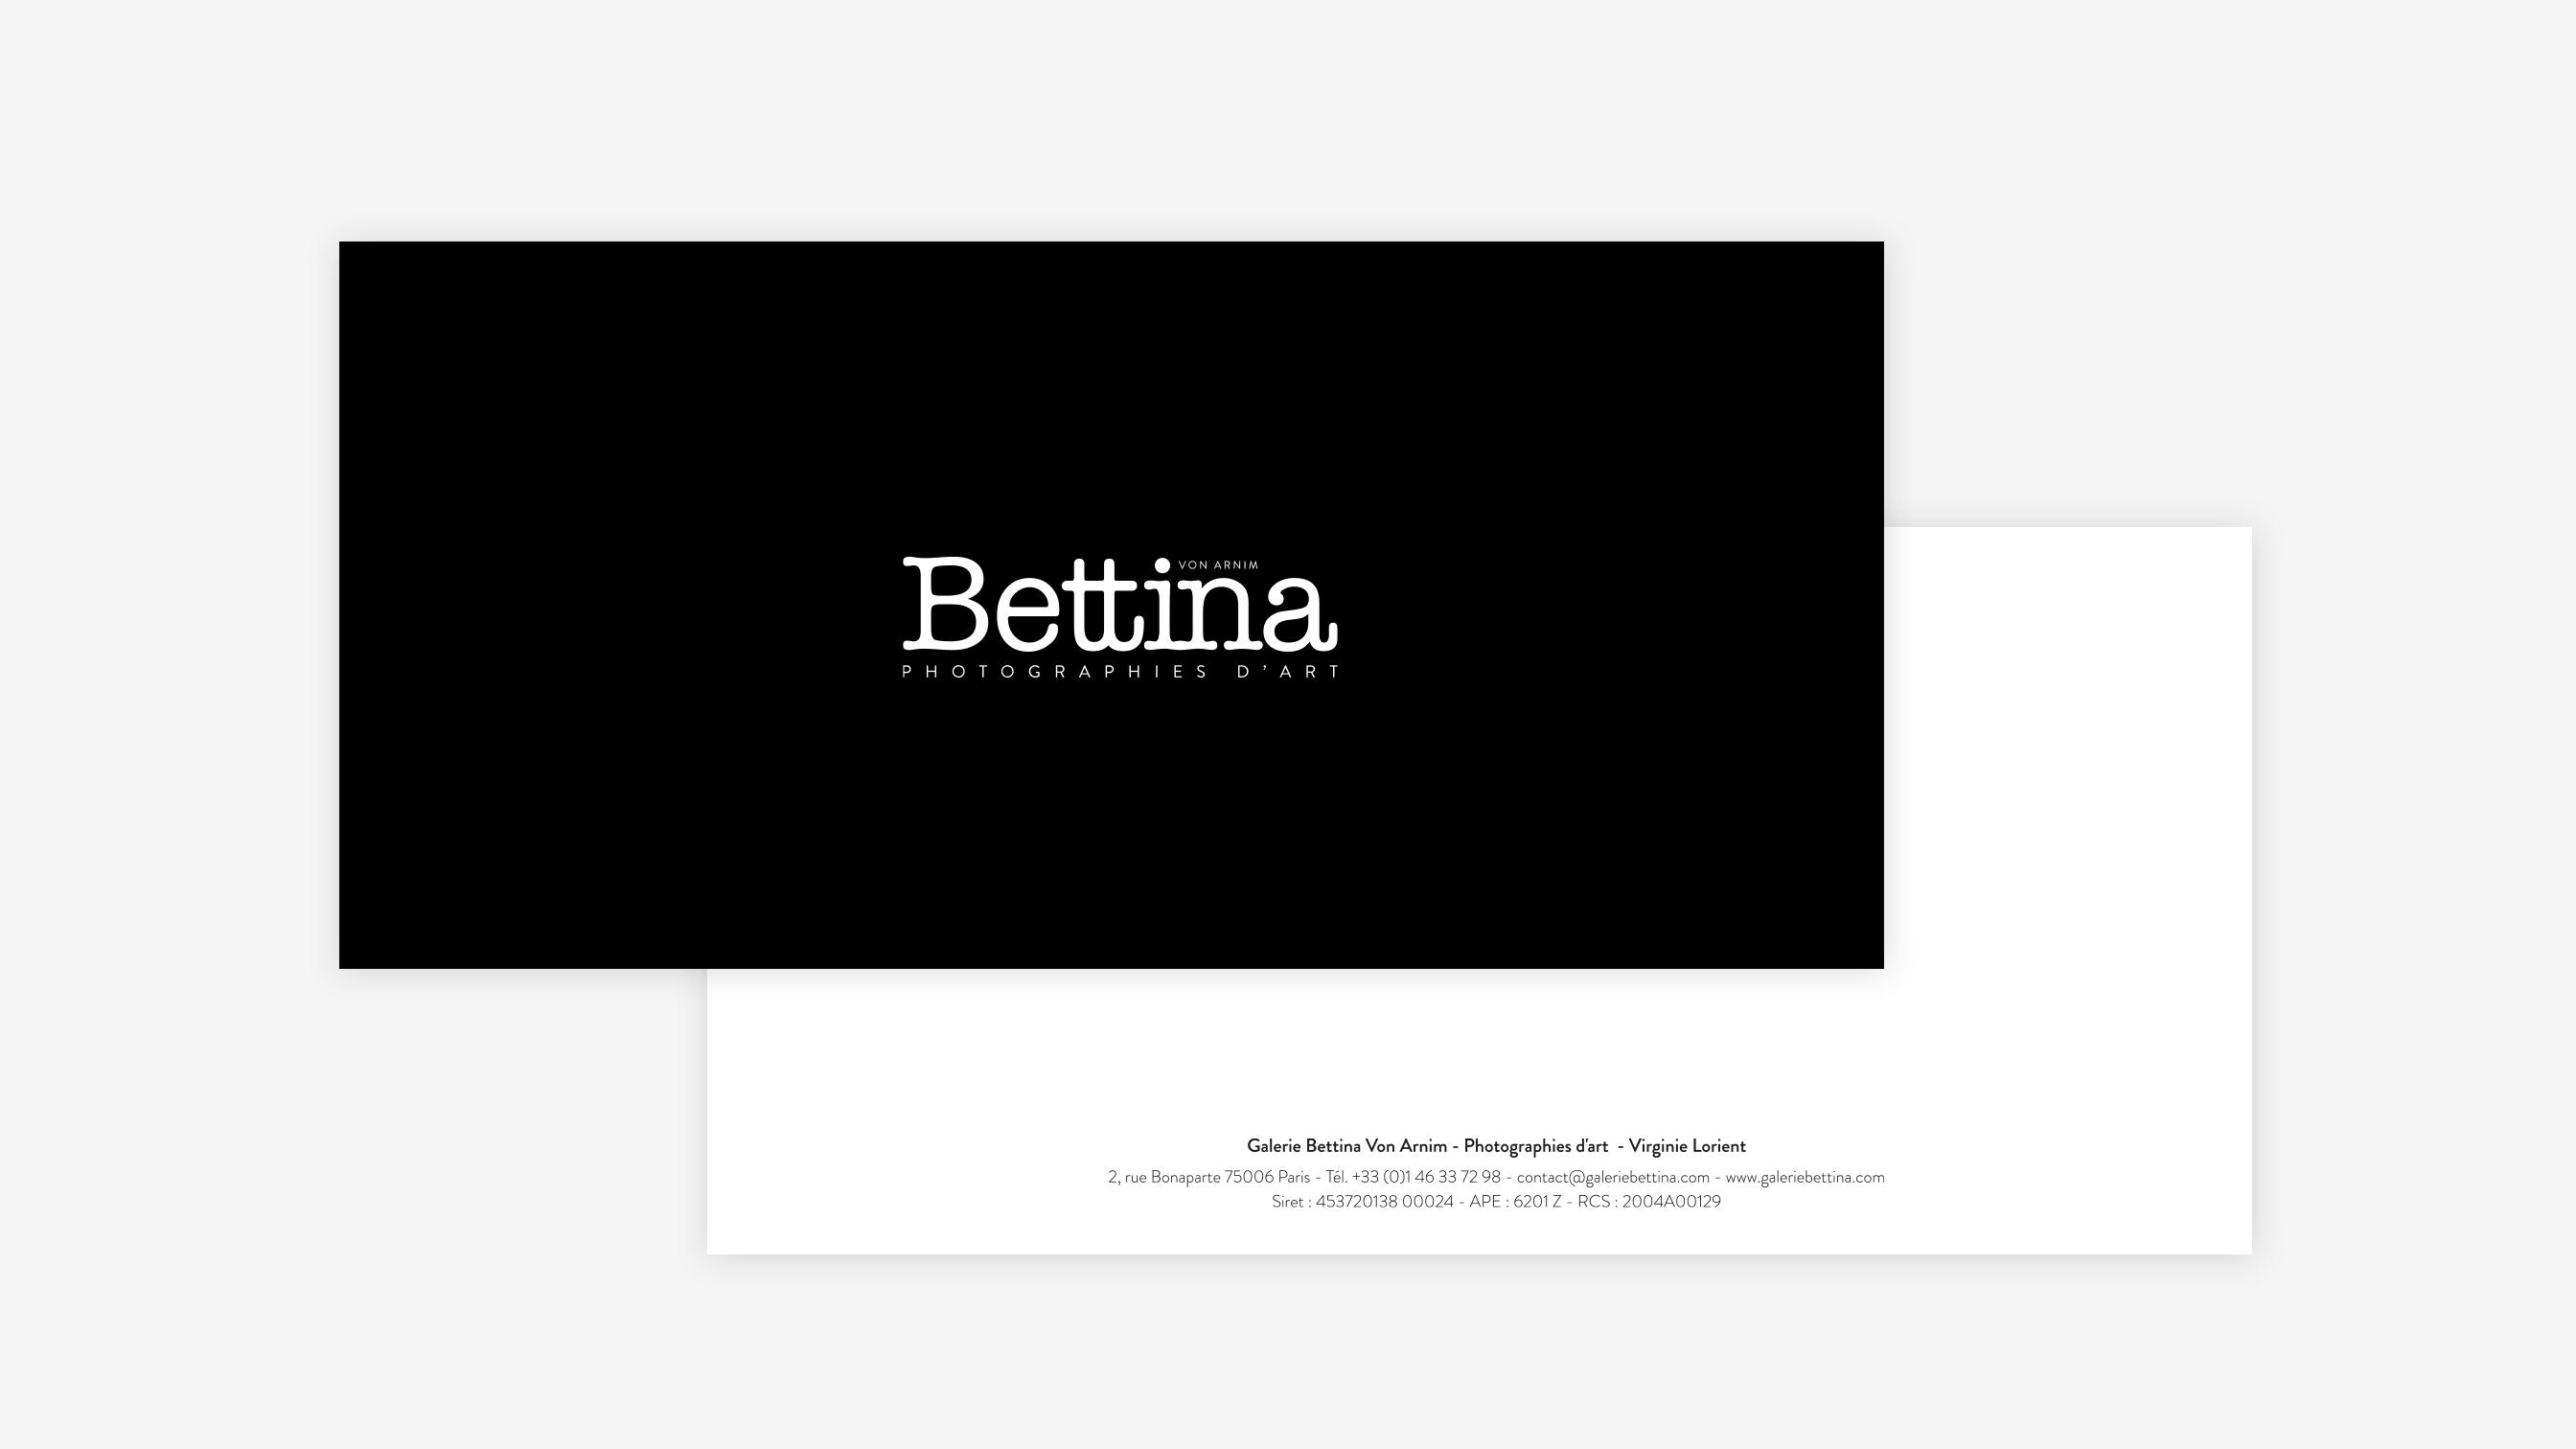 galeriebettina-cartes-correspondance-pikteo